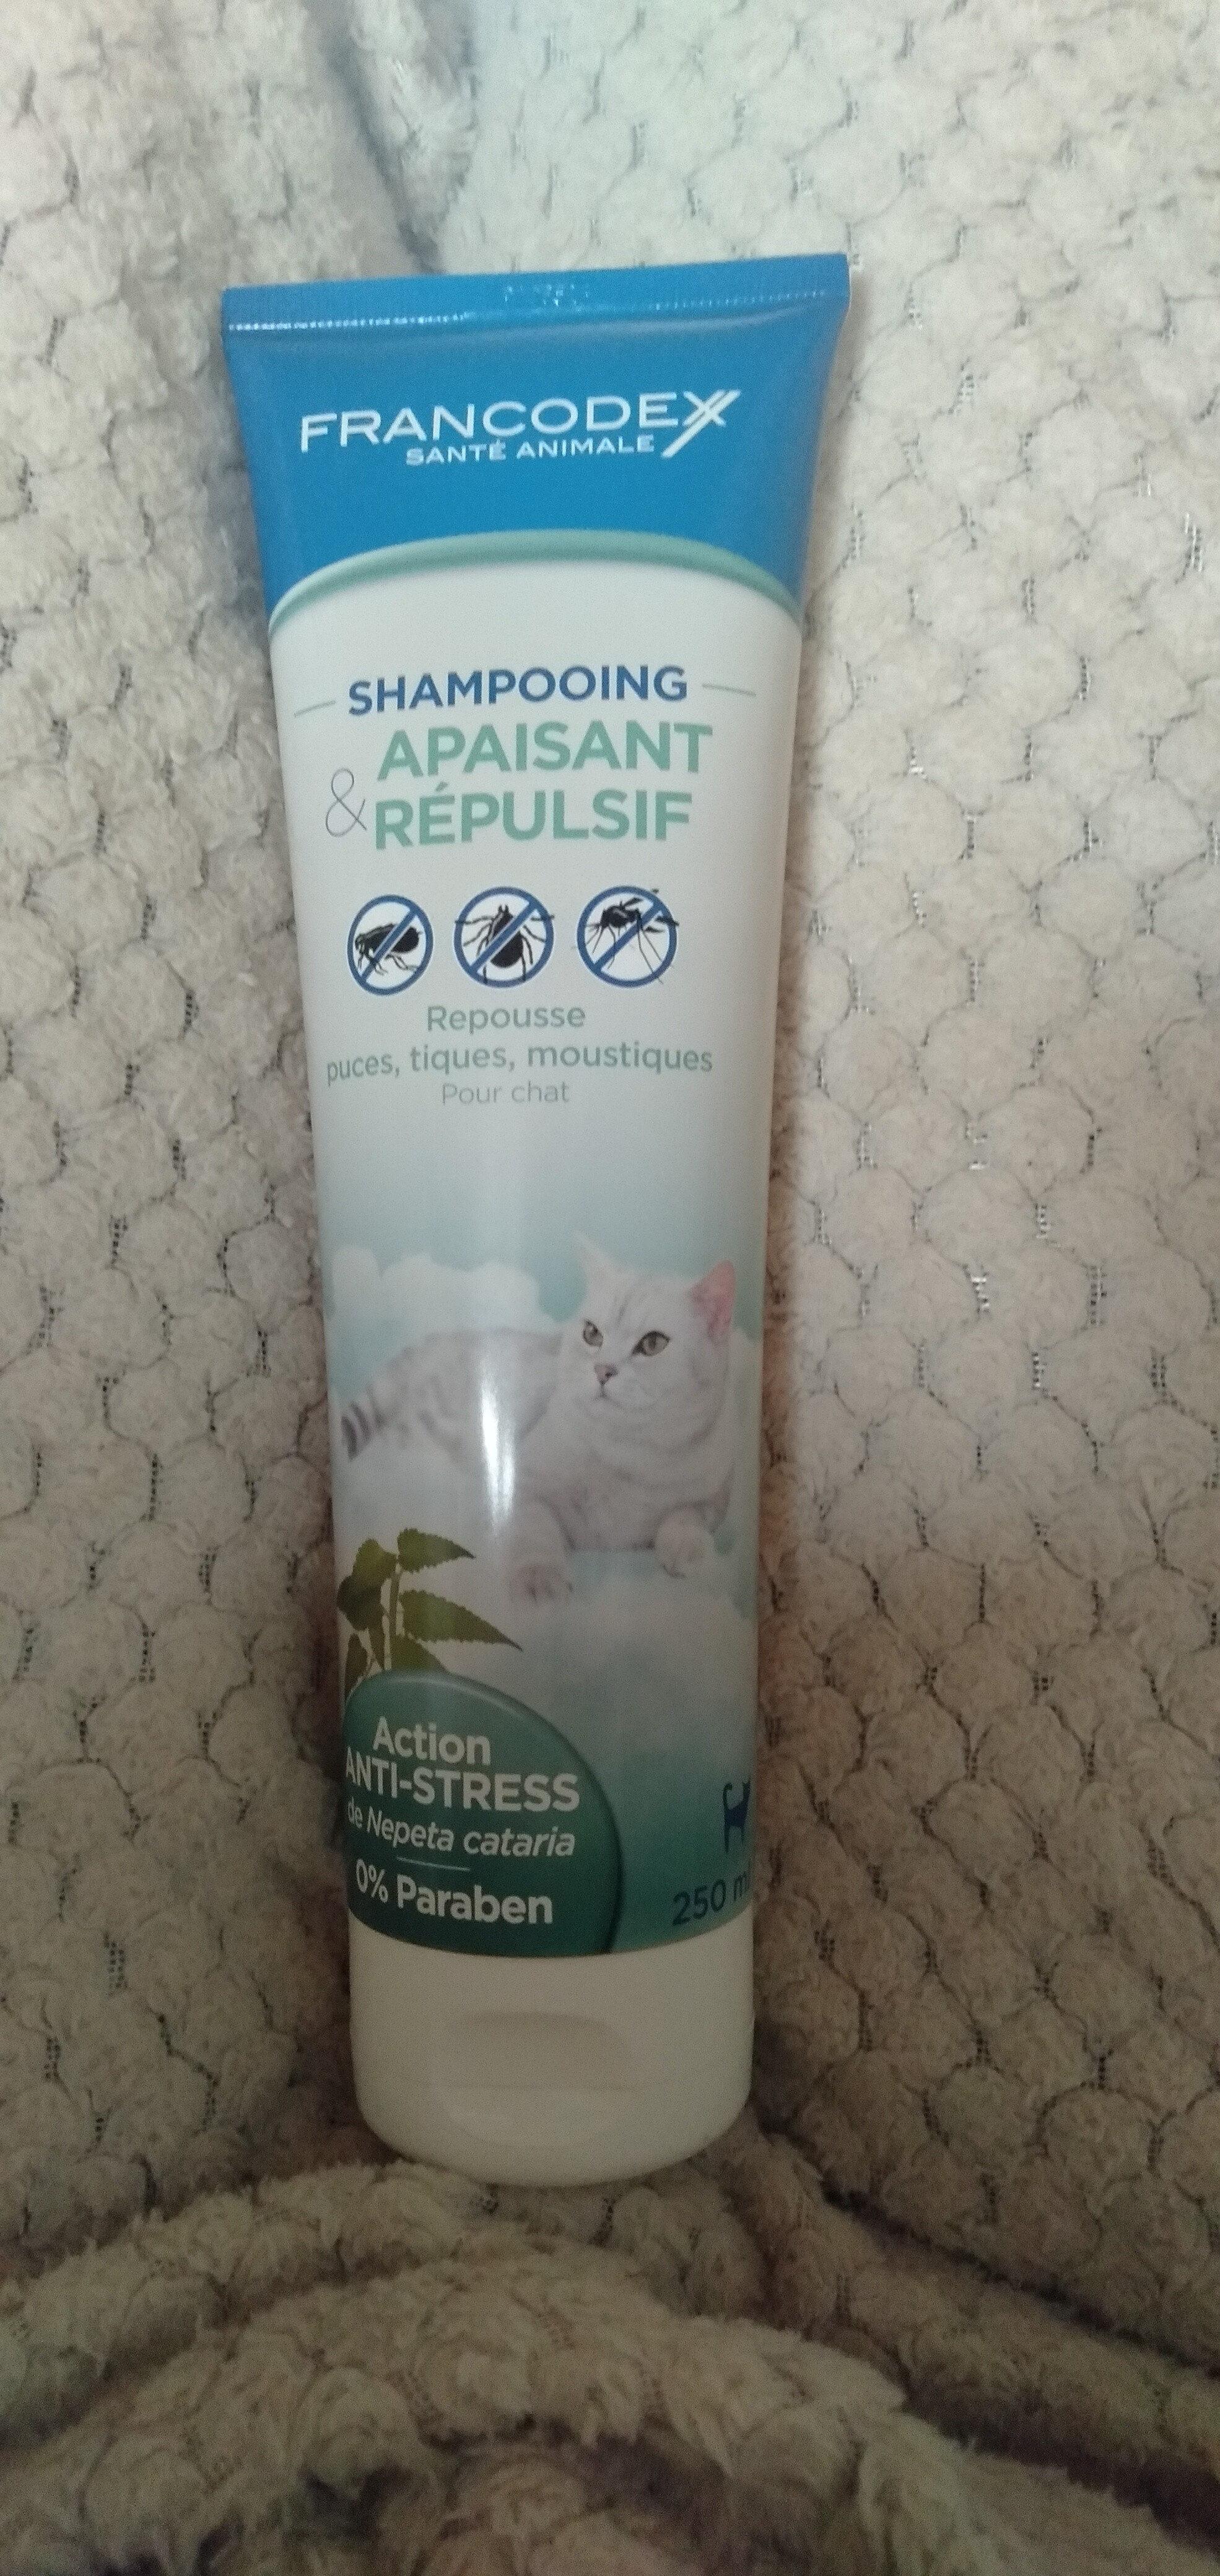 shampoing apaisant & répulsif - Produit - fr